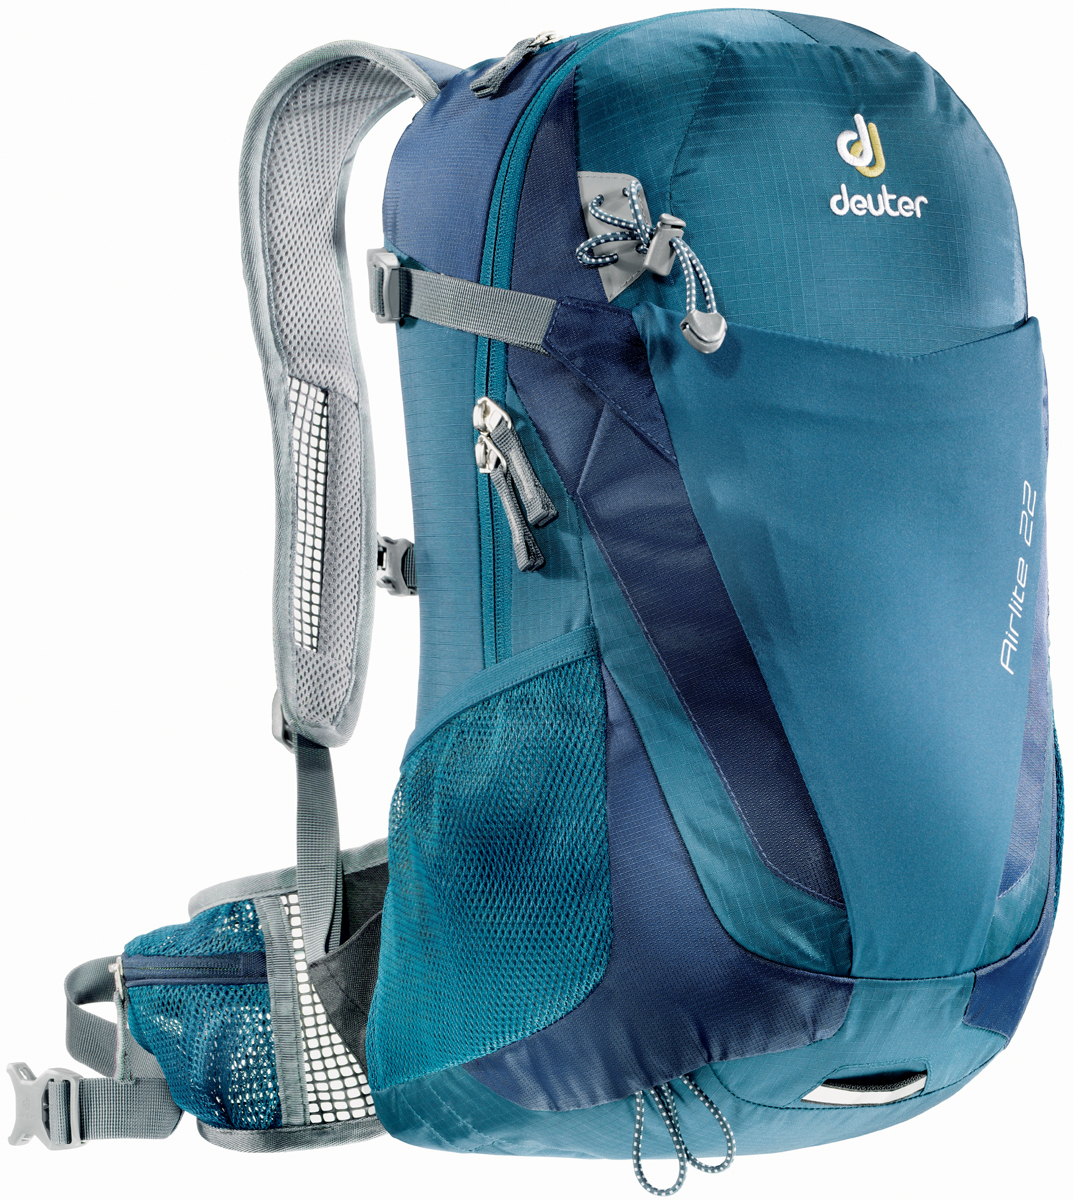 Рюкзак туристический Deuter Airlite, цвет: темно-синий, 22 л рюкзак туристический trek planet colorado 65 цвет синий темно синий 65 л